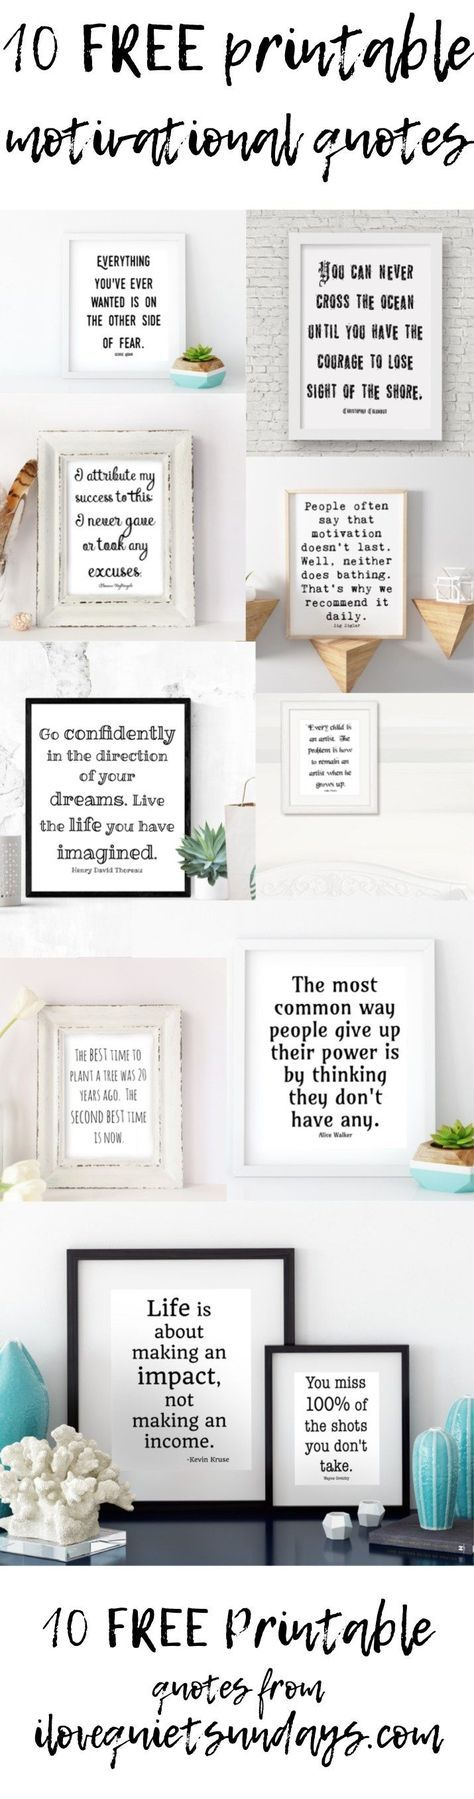 Free printable motivational quotes black and white 8x10 printables at ilovequietsundays.com #motivational